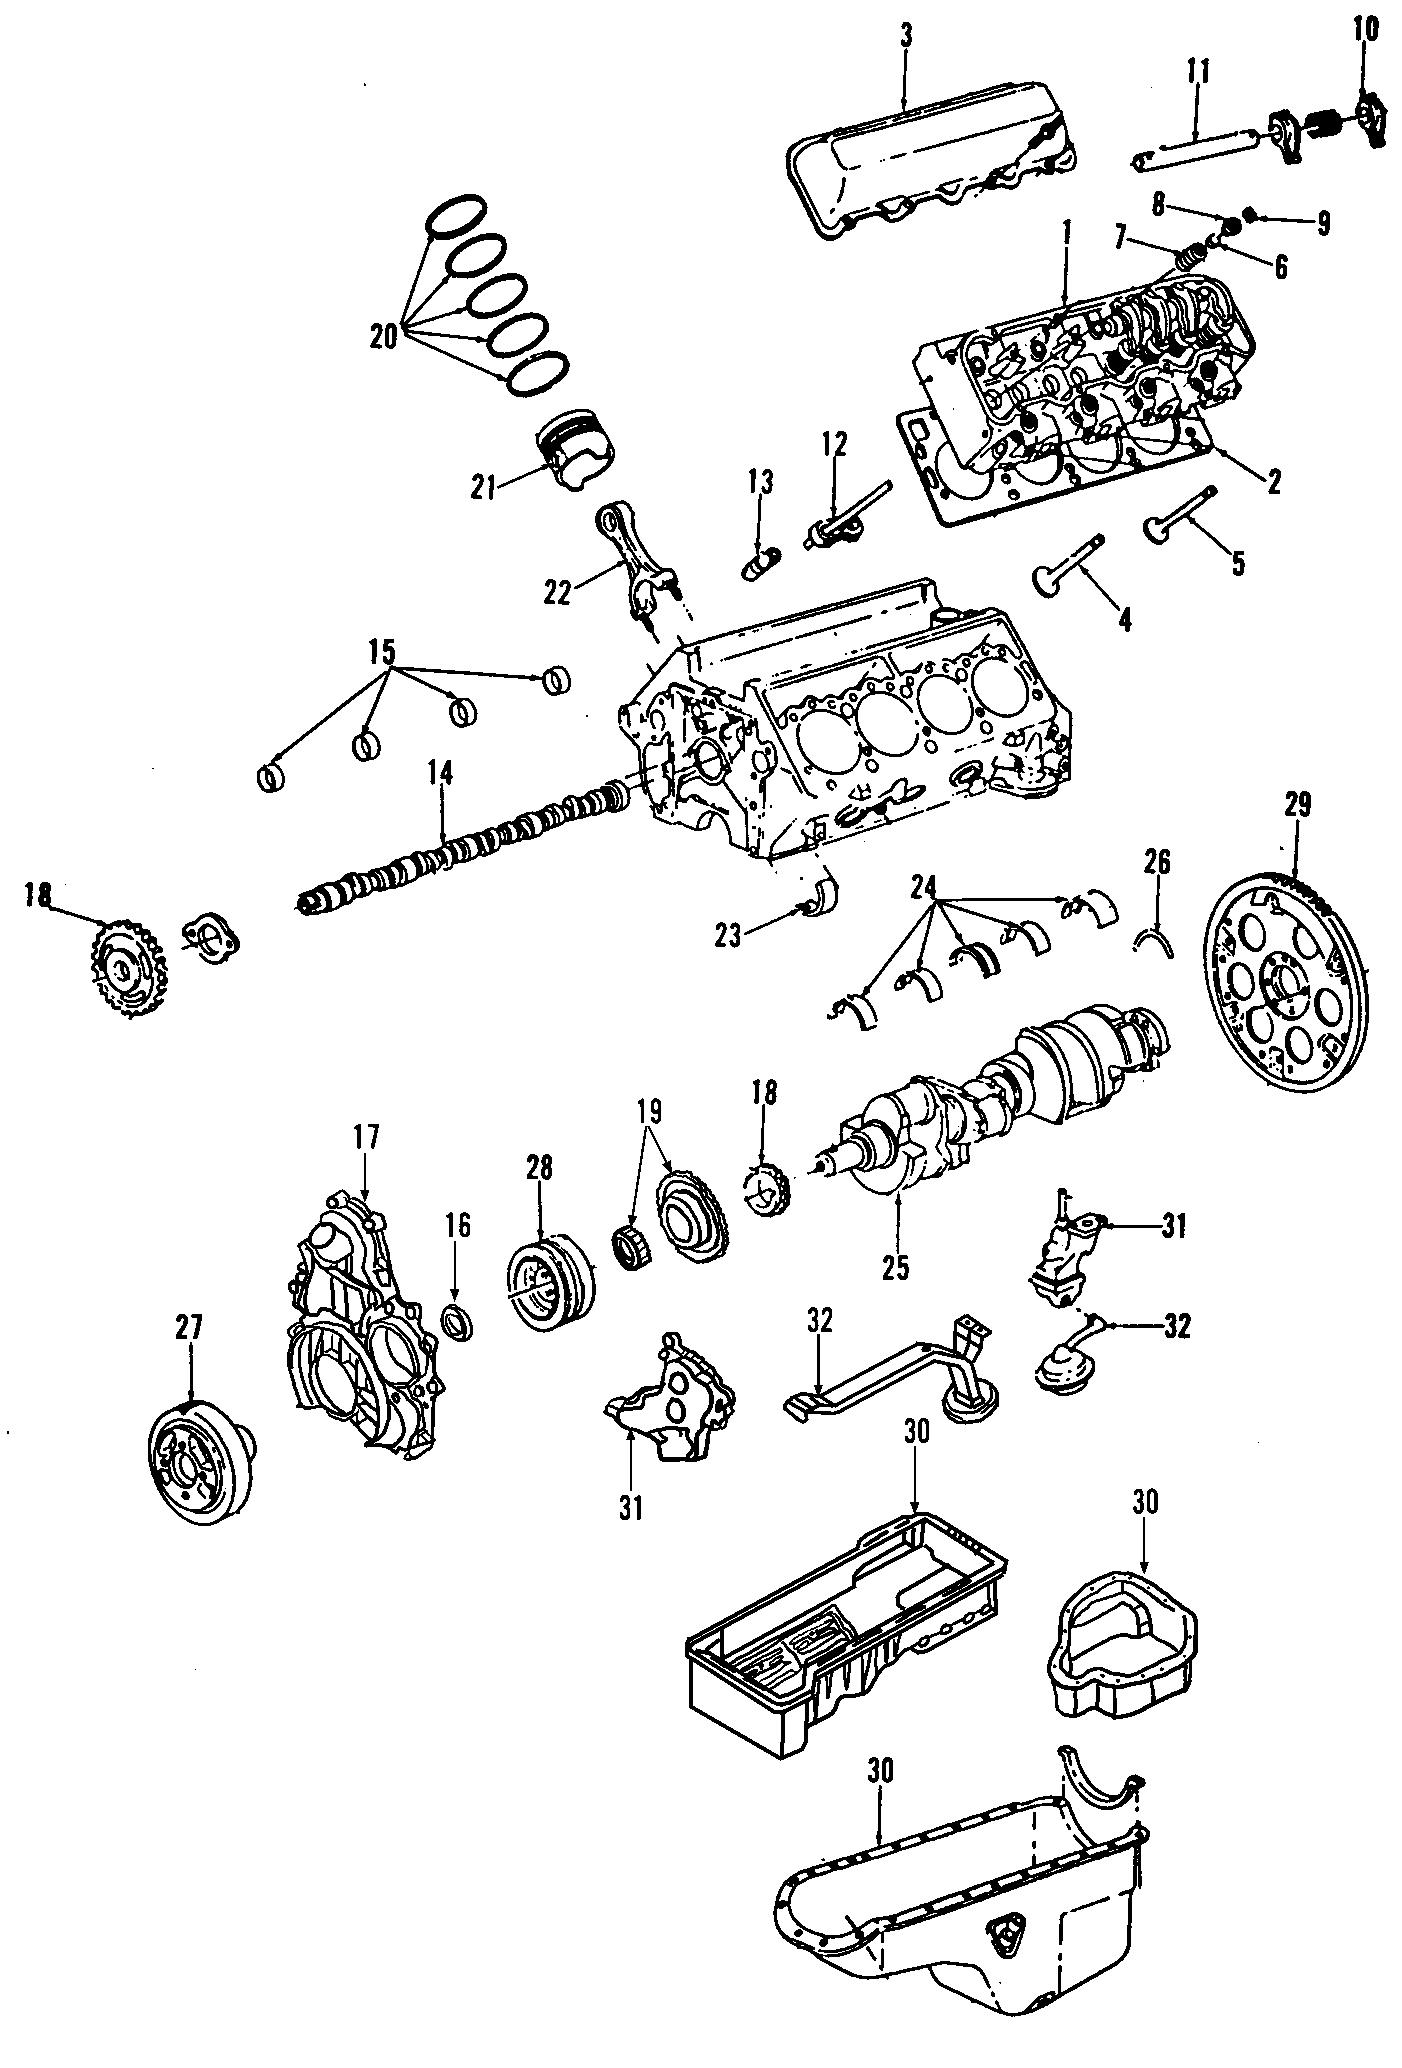 Engine Oil Pan Lower